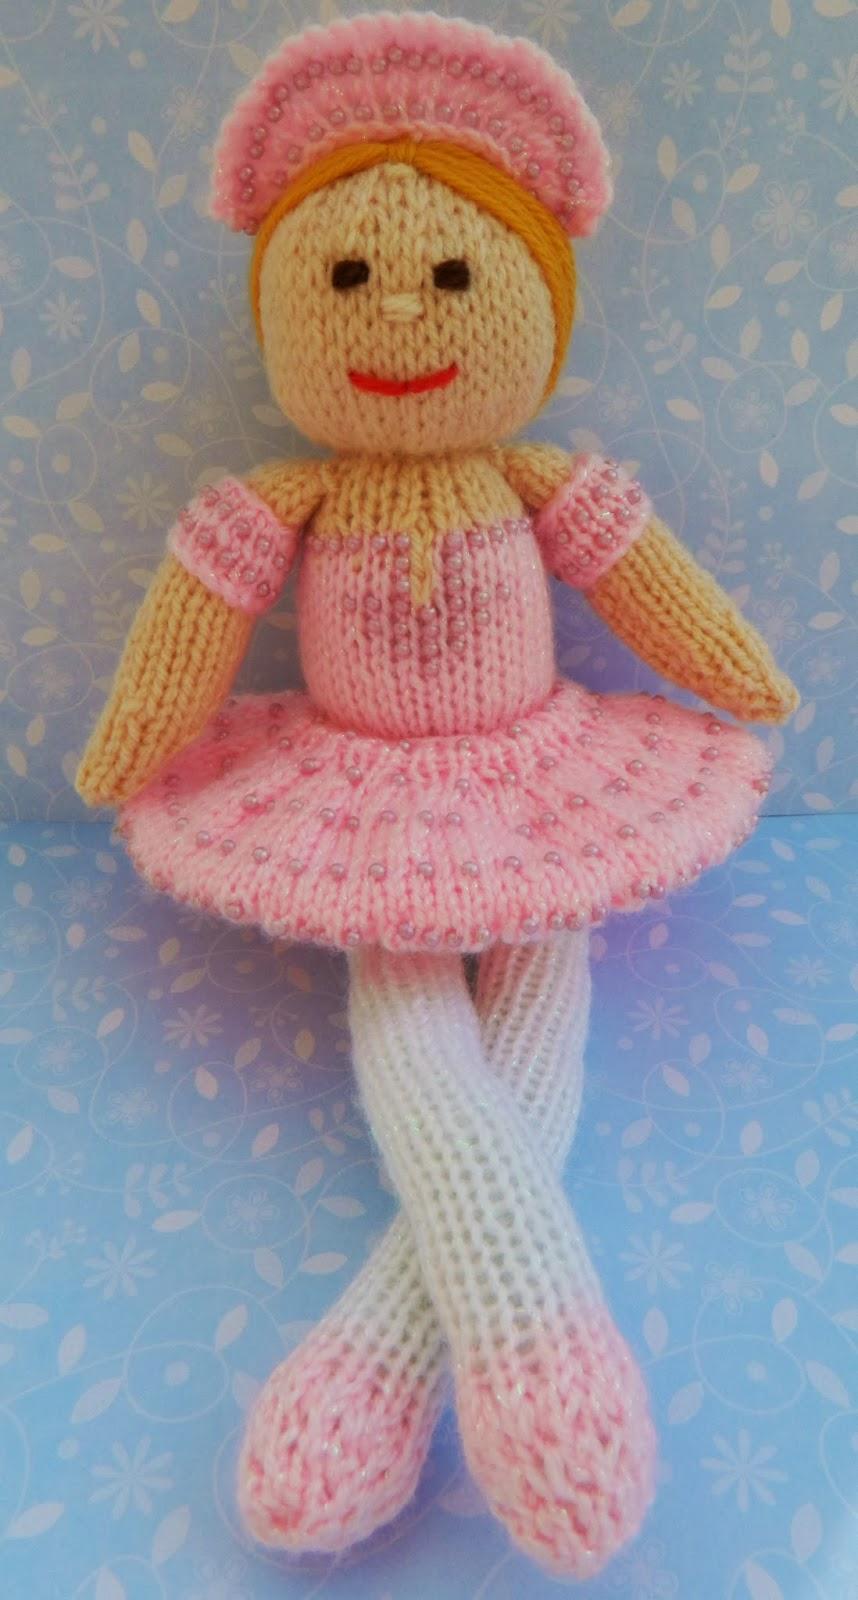 Edith Grace Designs - Original Doll & Toy Knitting ...